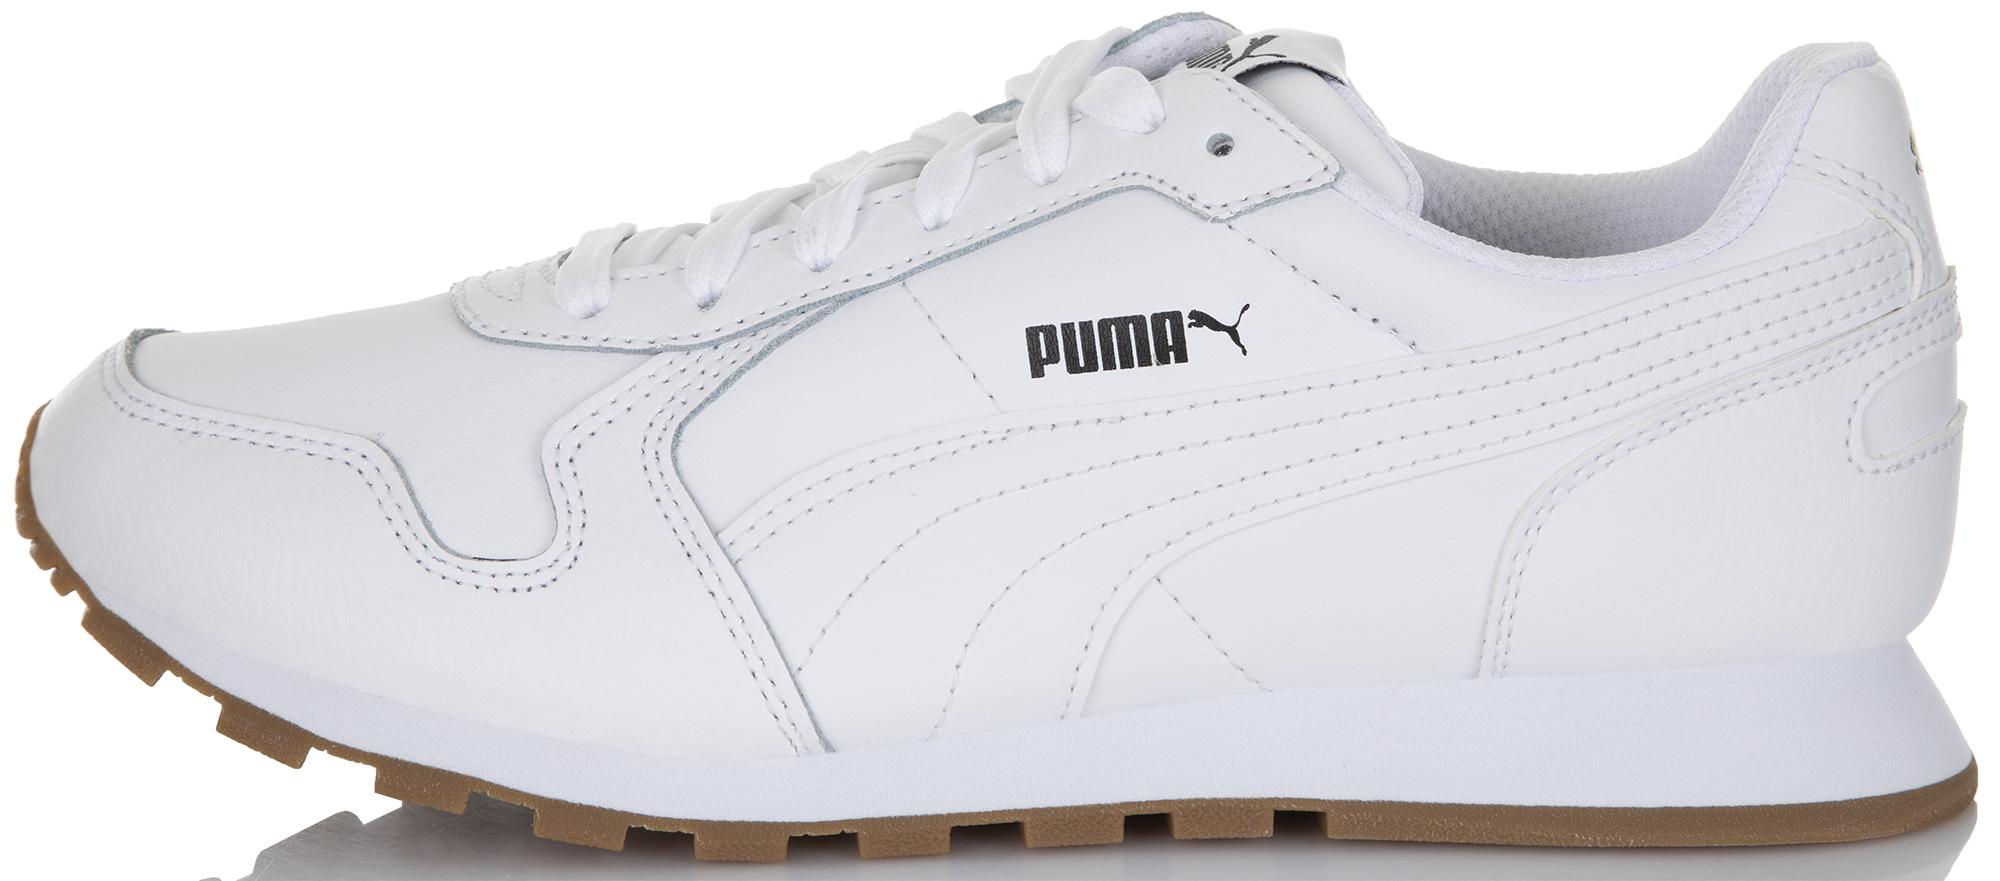 Puma Кроссовки женские Puma ST Runner Full, размер 36